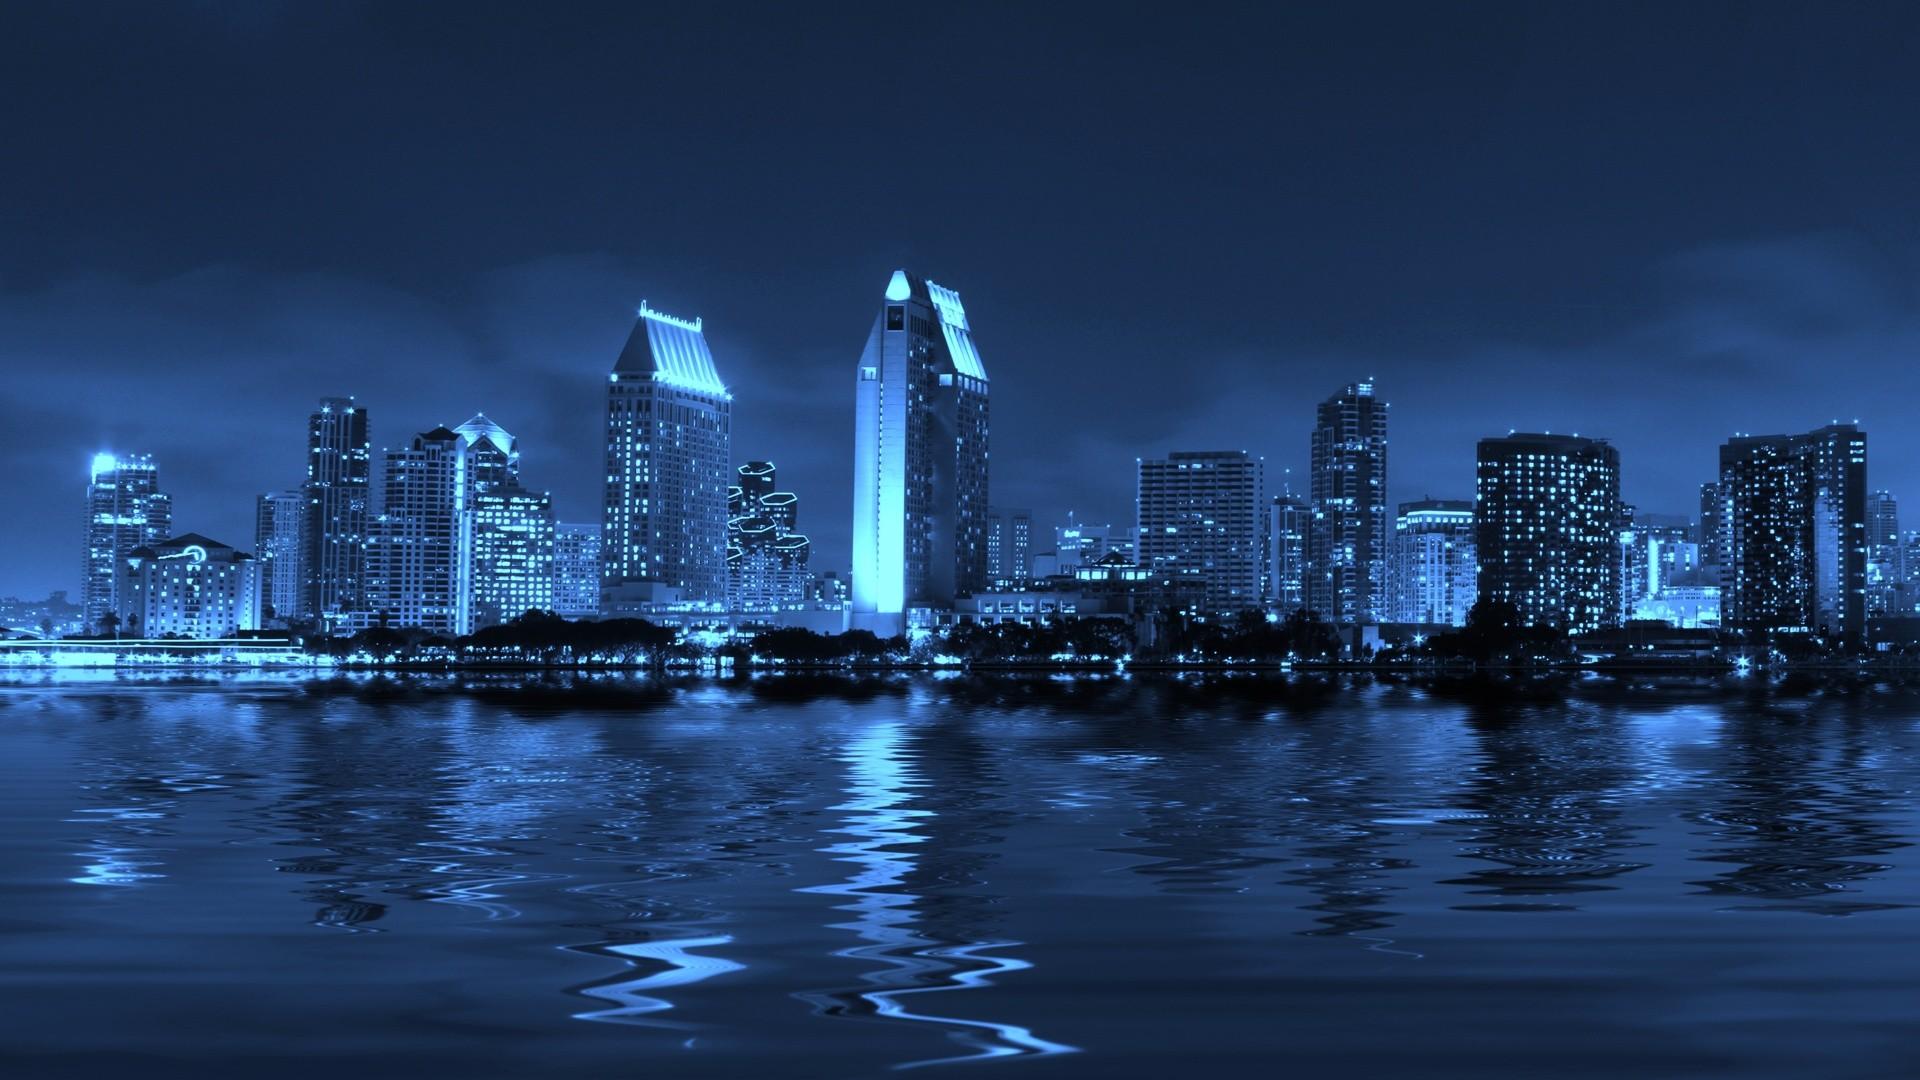 Blue Bayou San Diego wallpaper download page 567675